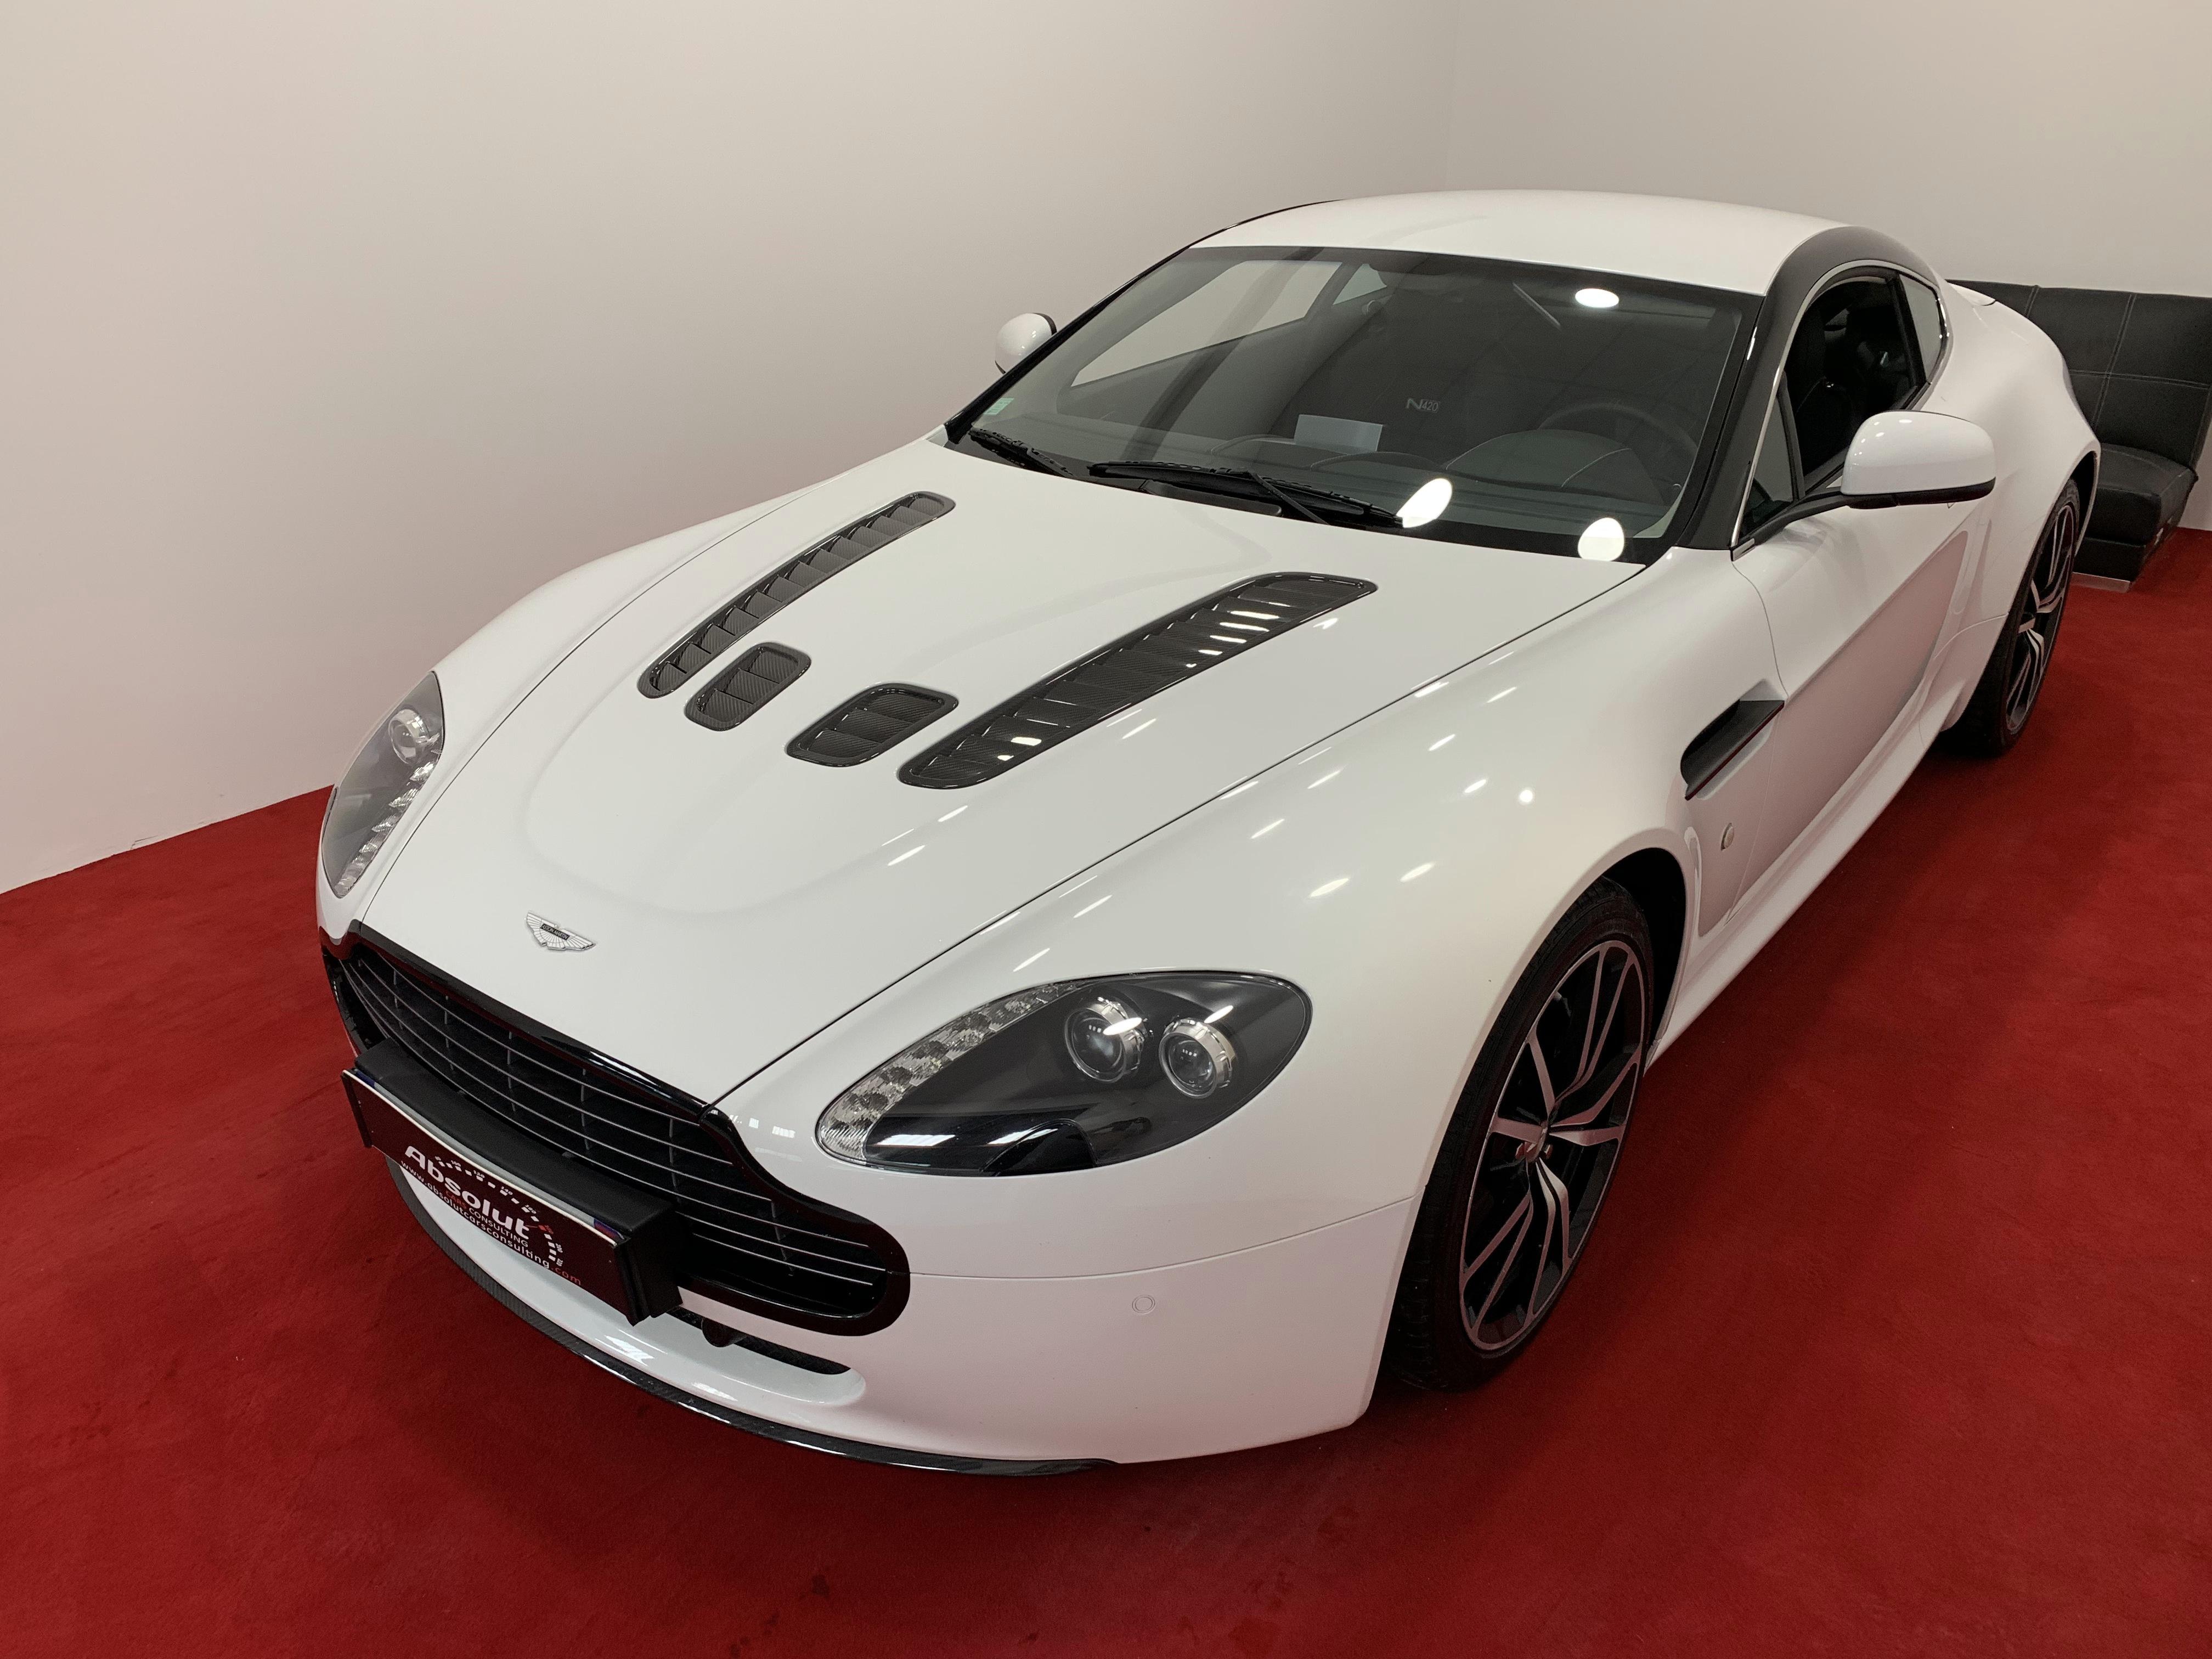 2011 Aston Martin V8 Vantage N420 Limited Edition Classic Driver Market